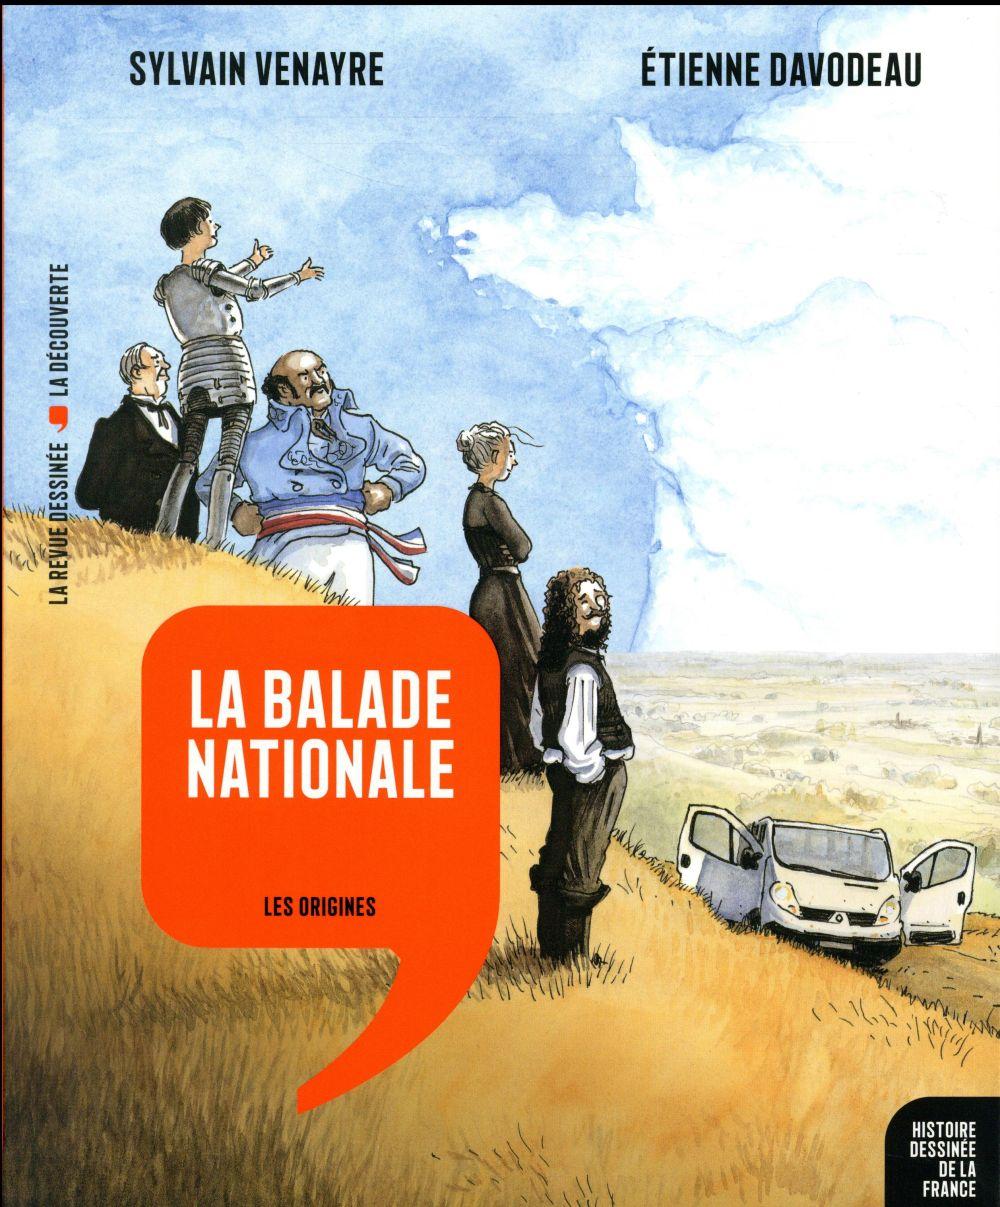 LA BALADE NATIONALE (HISTOIRE DESSINEE DE LA FRANCE T1)